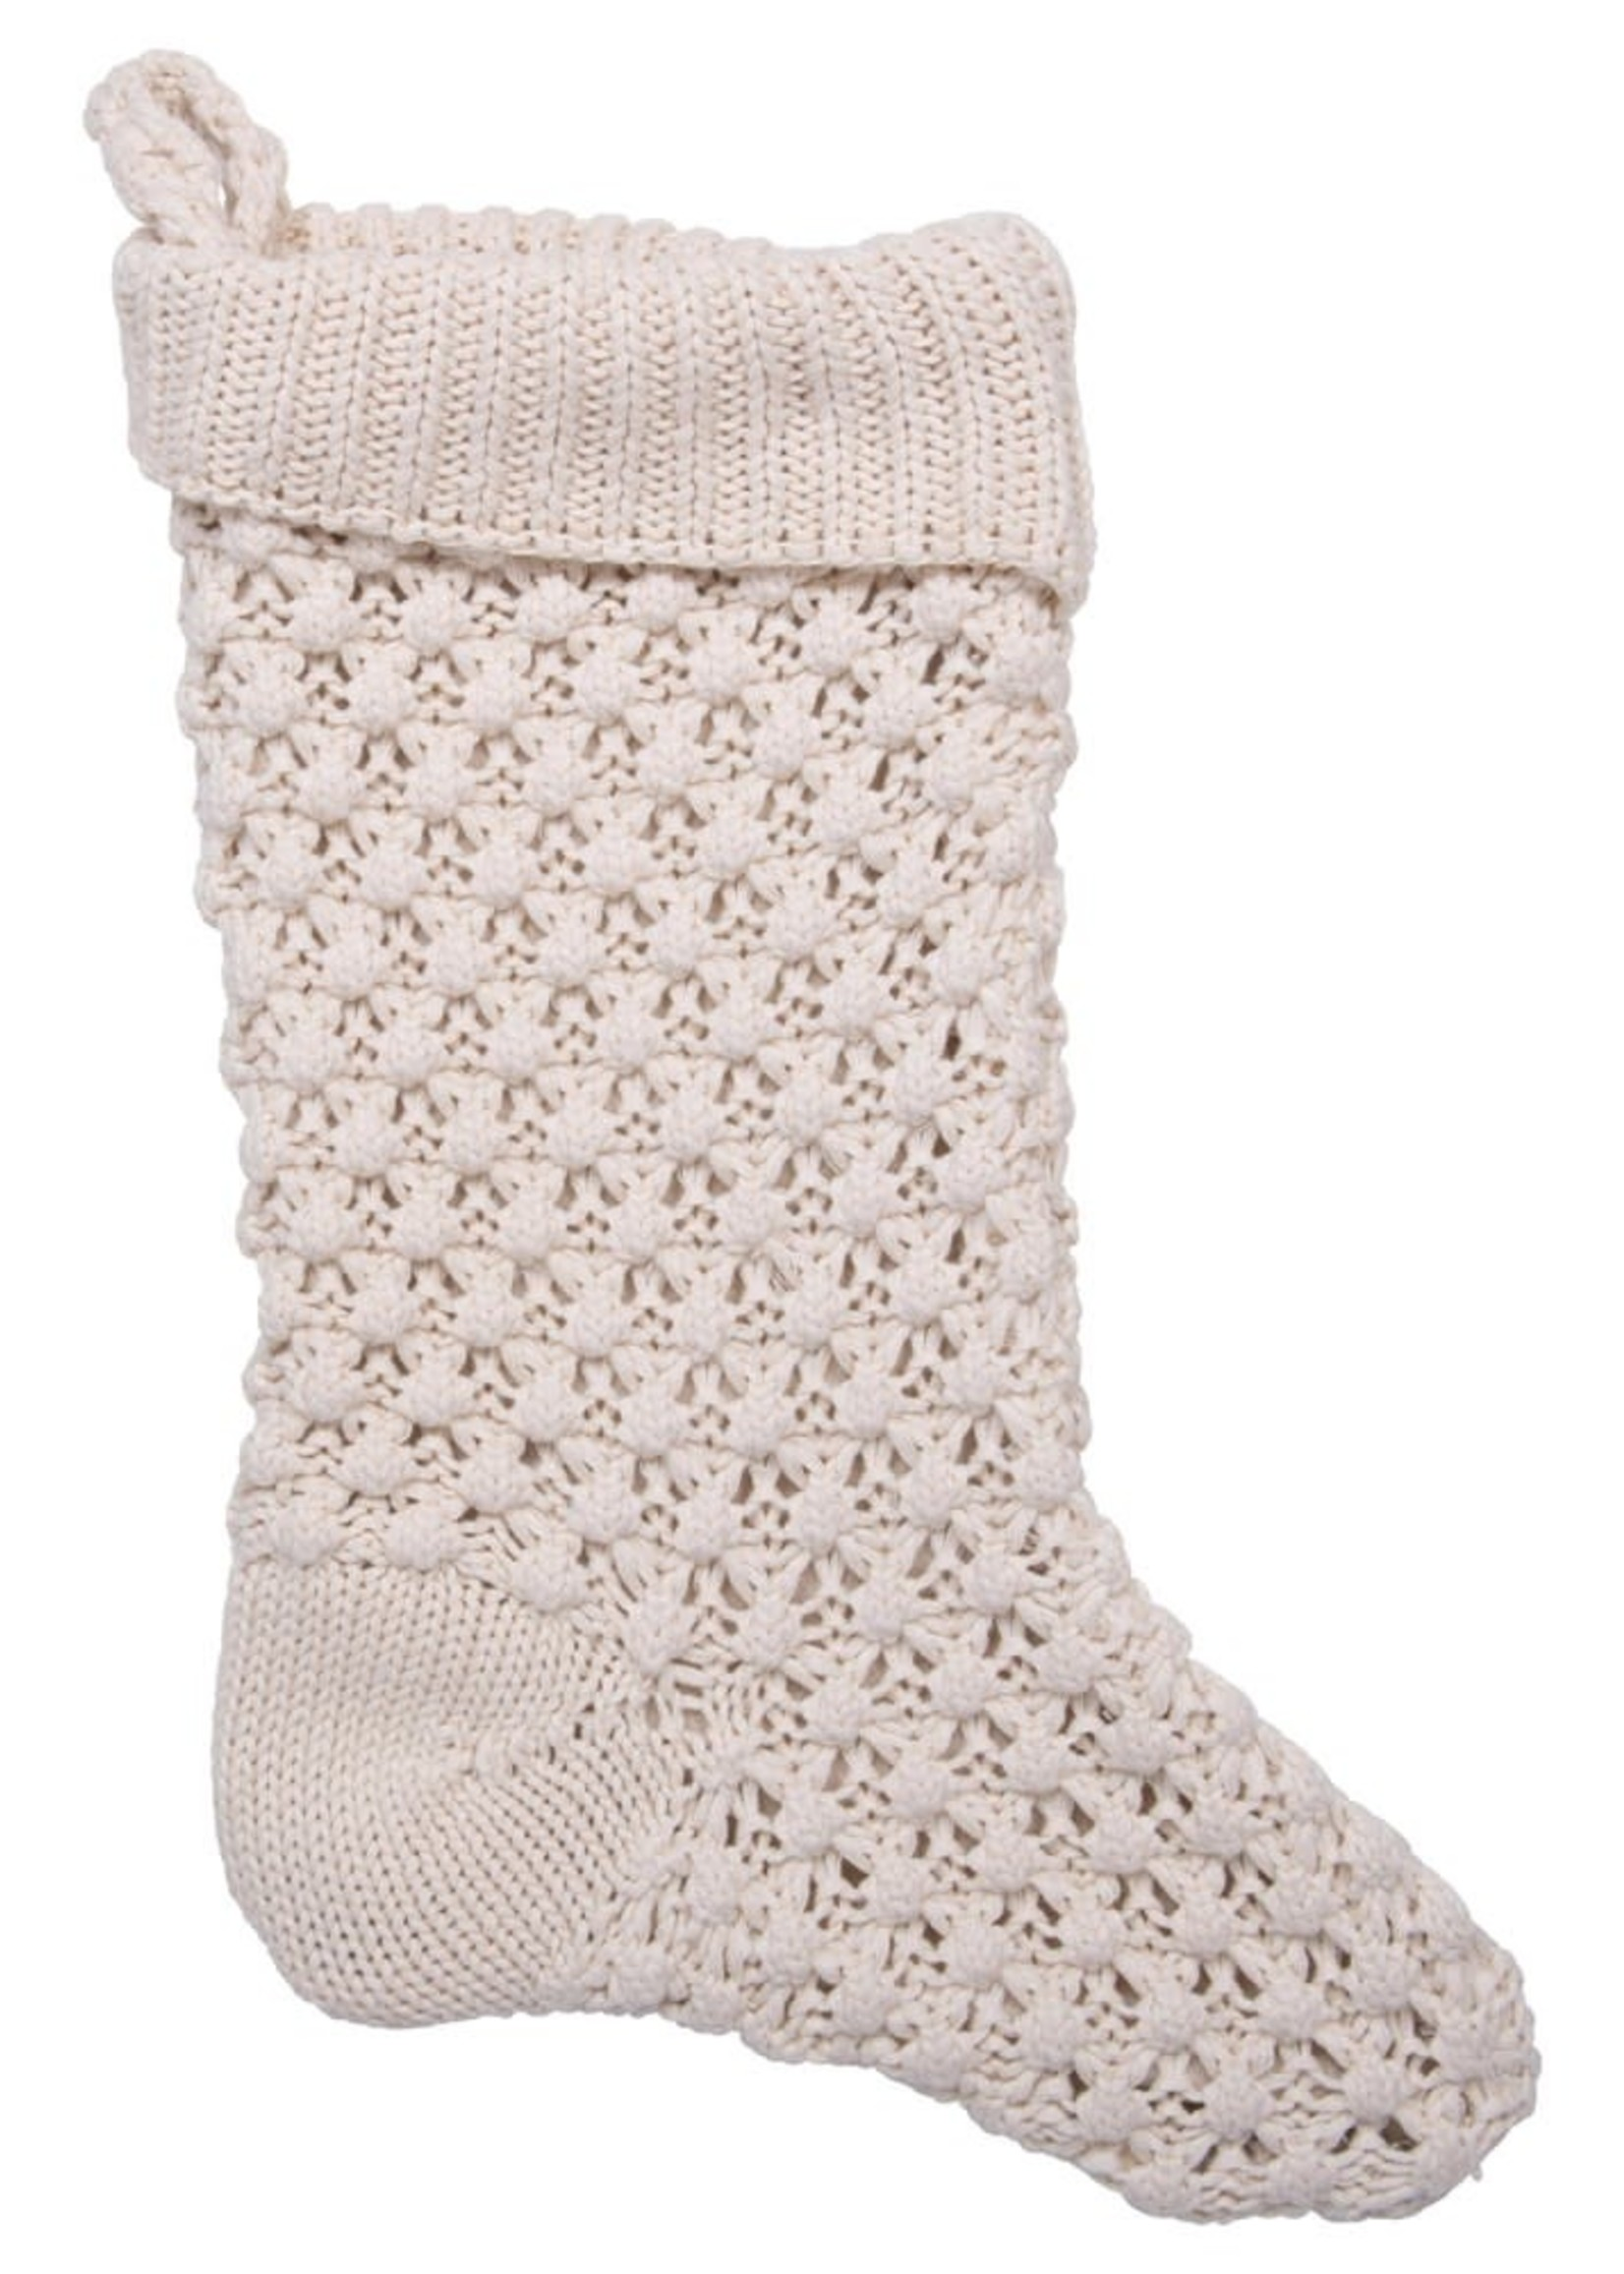 Cotton Knit Stocking, Cream Color